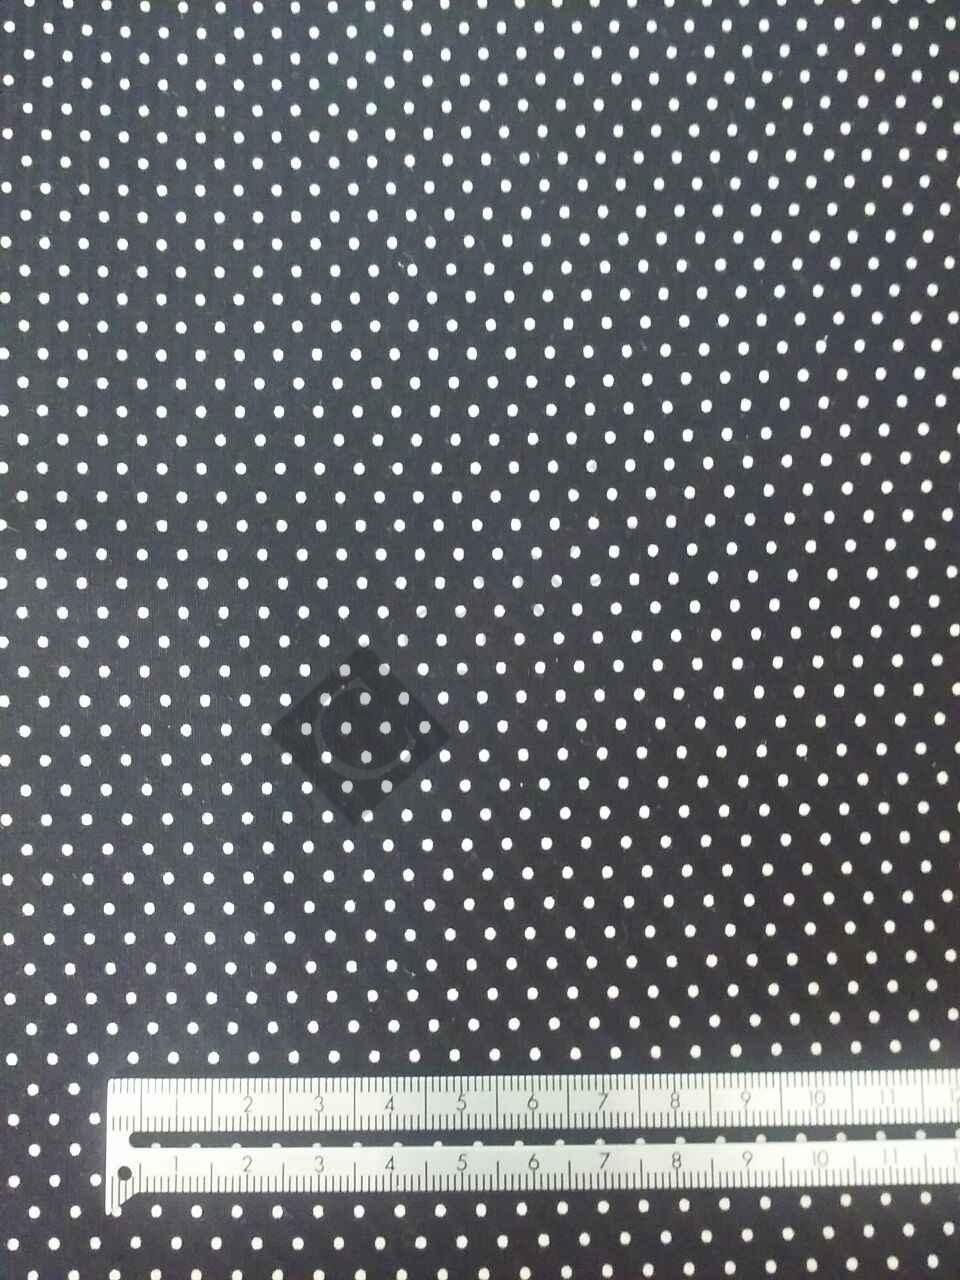 Black & White small dots 171-23